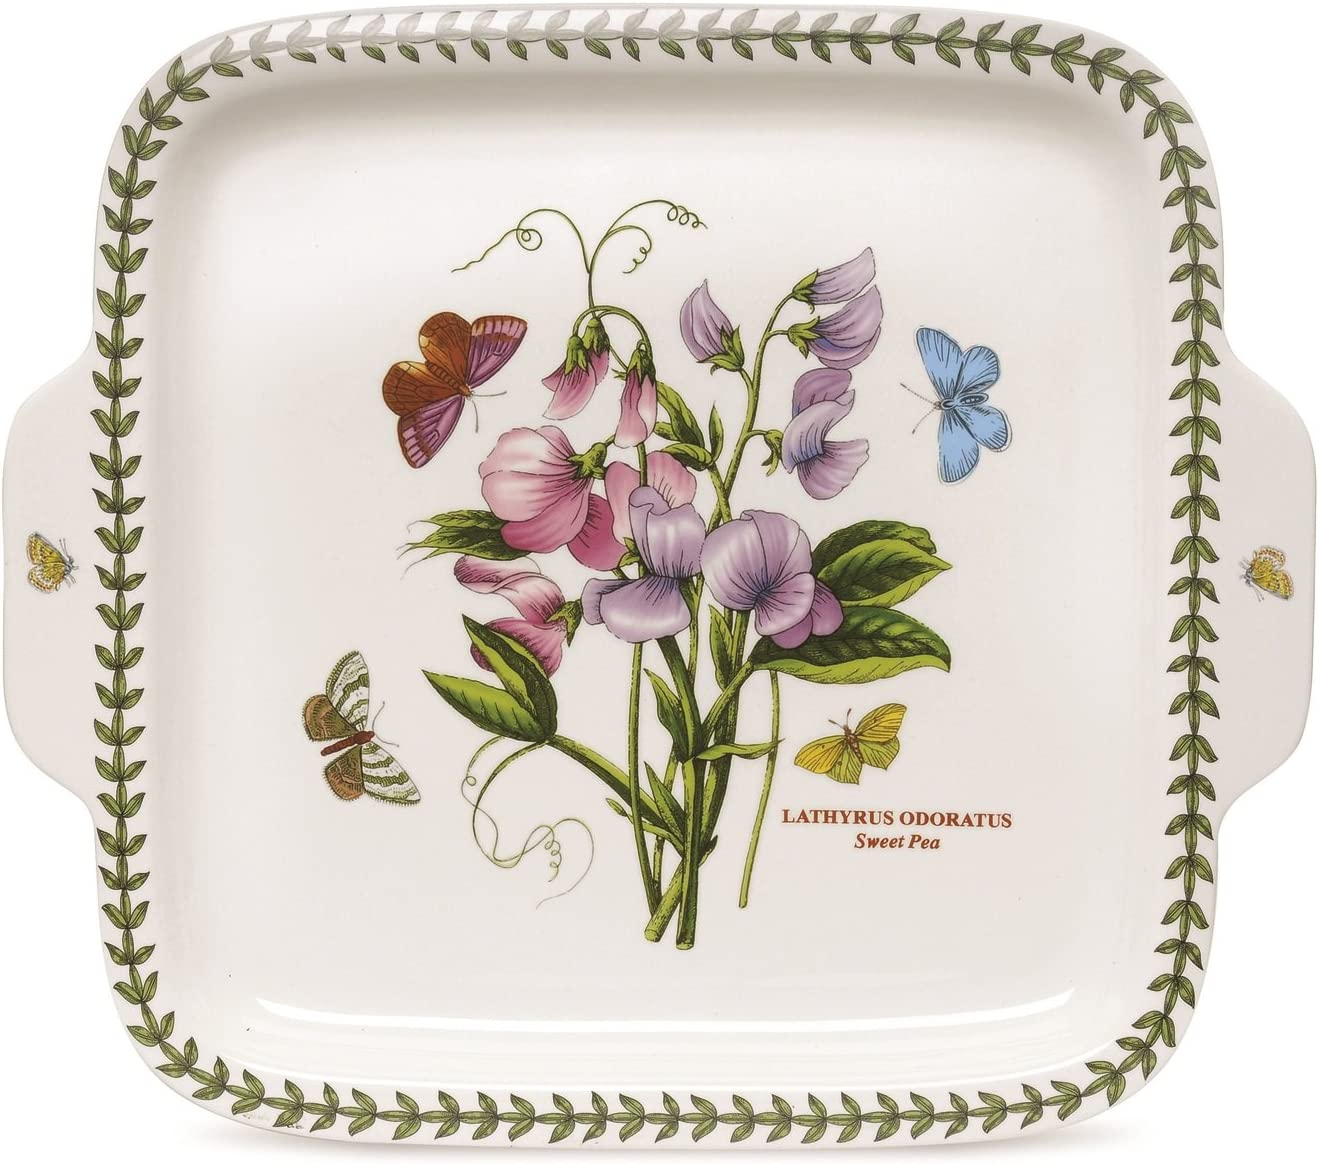 Portmeirion Botanic Garden Square Dessert Dish with Handles